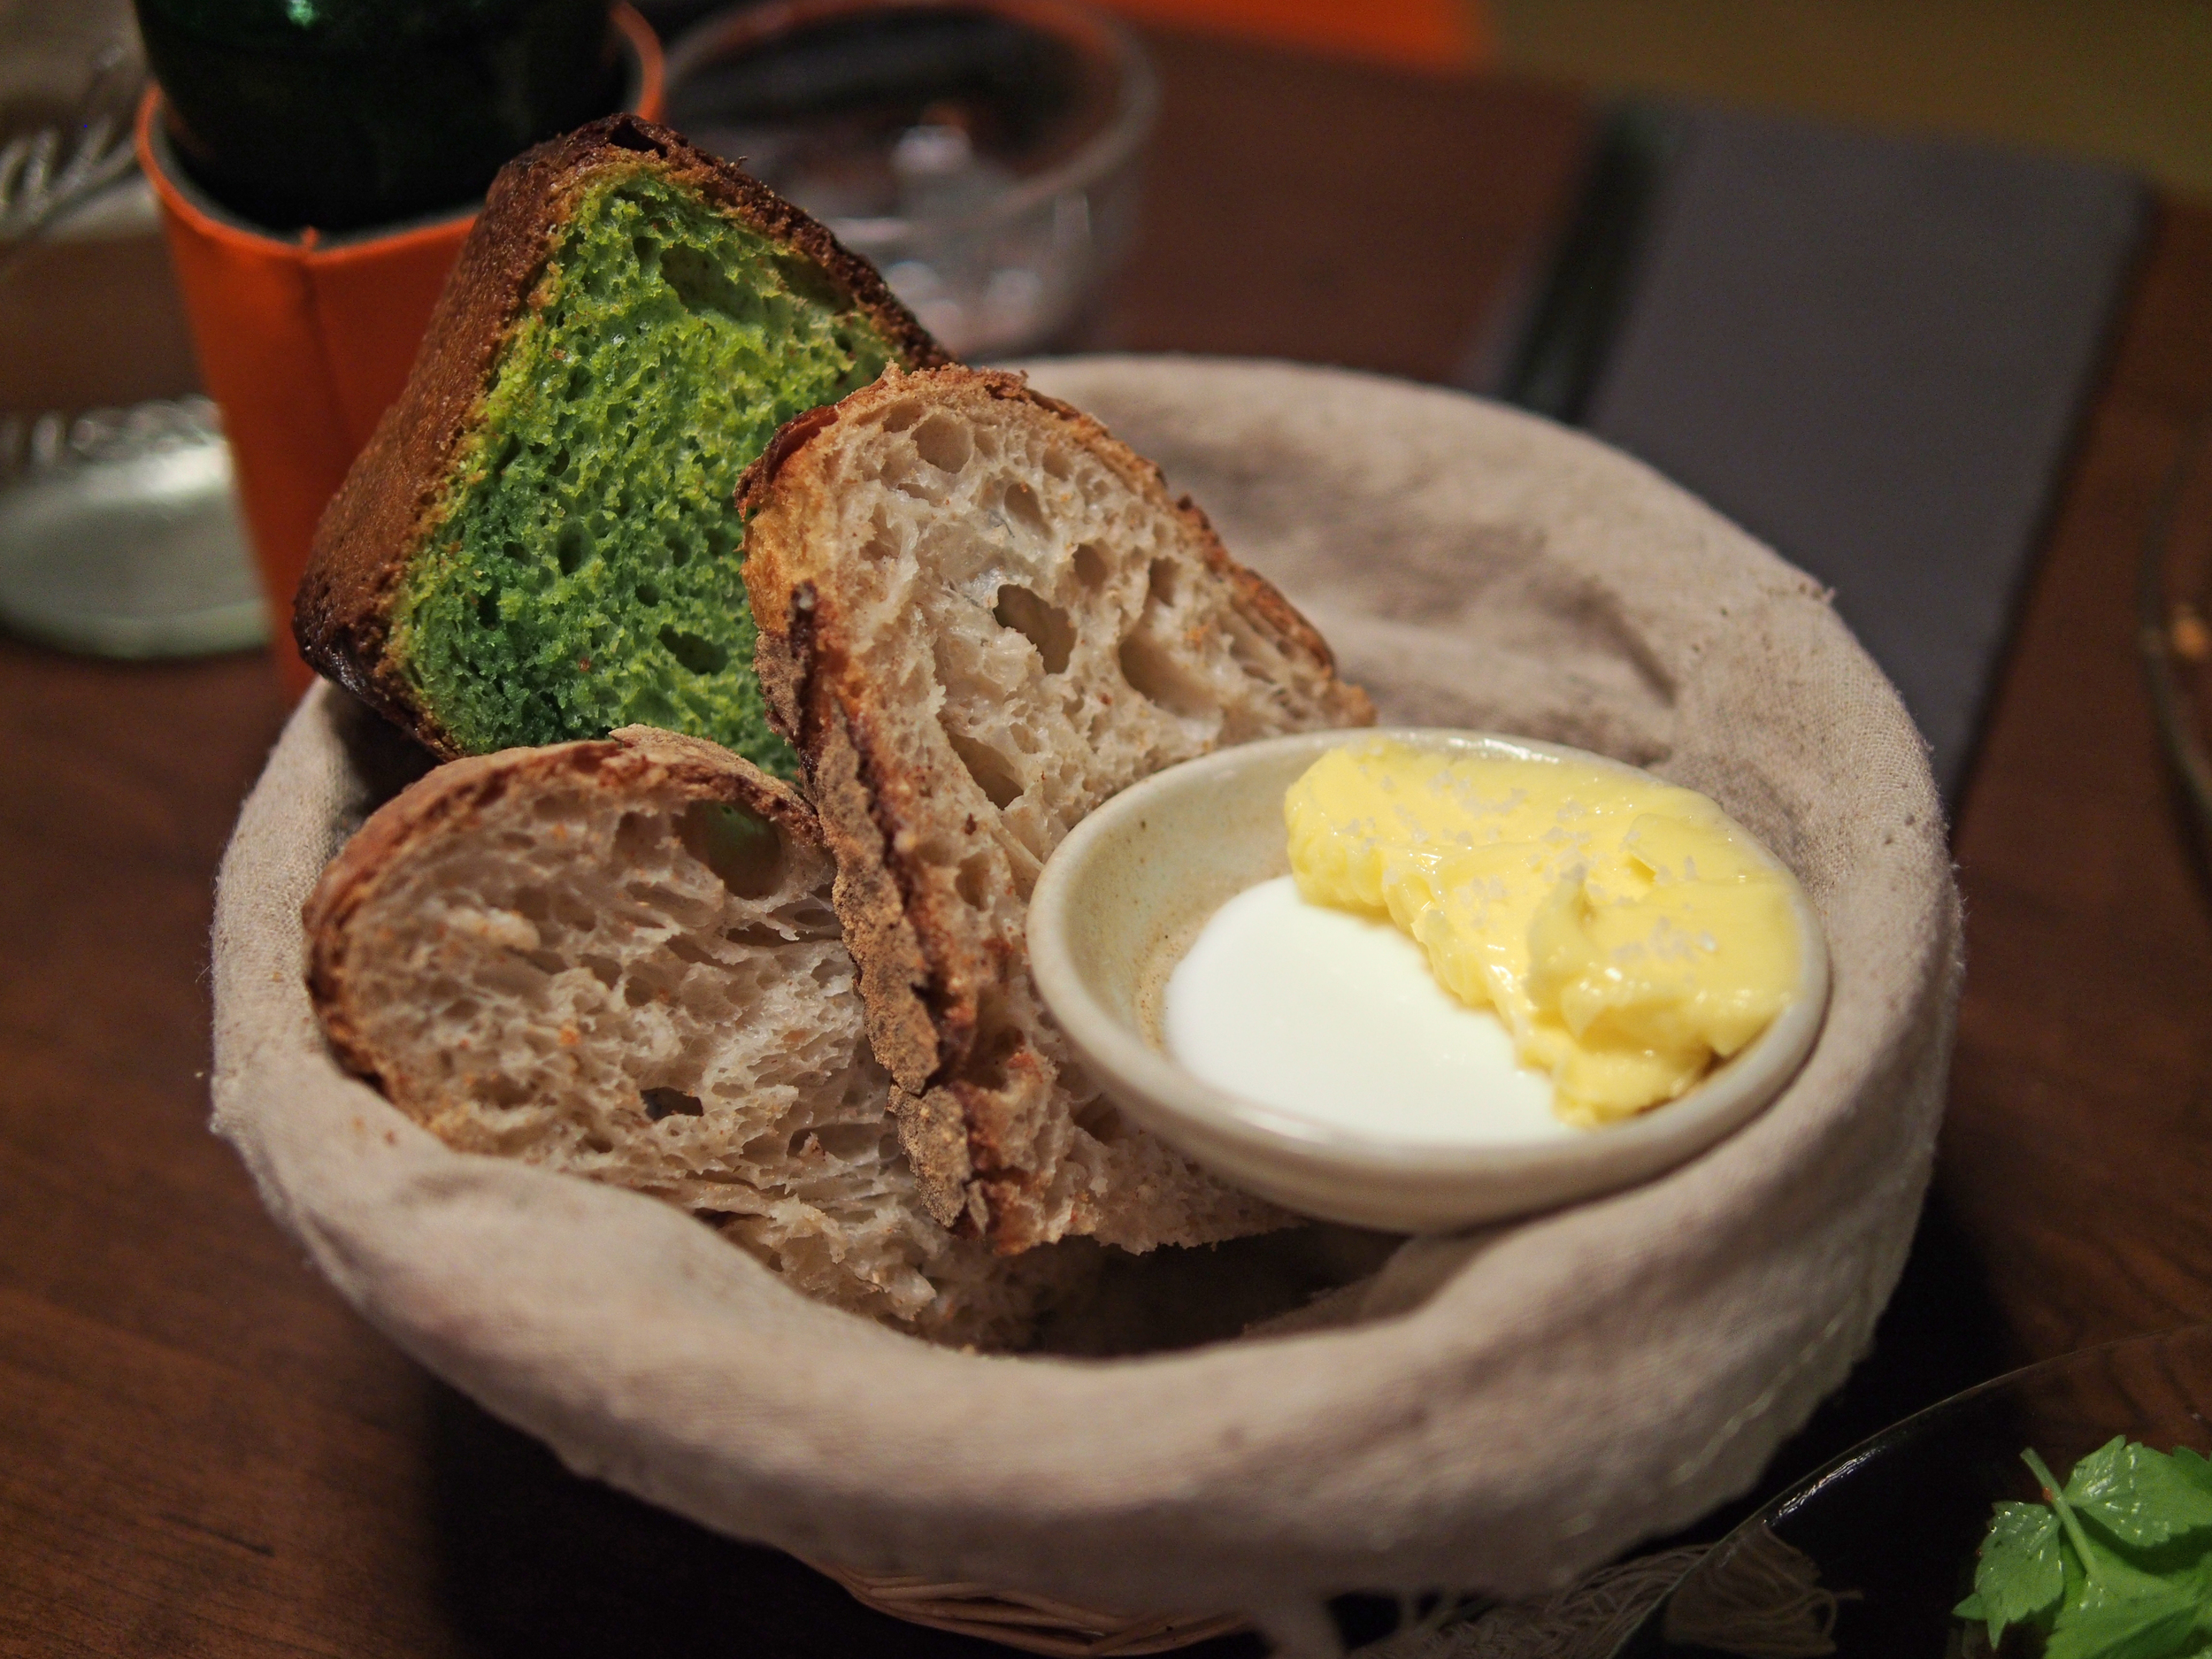 Stinging nettle brioche and buttermilk